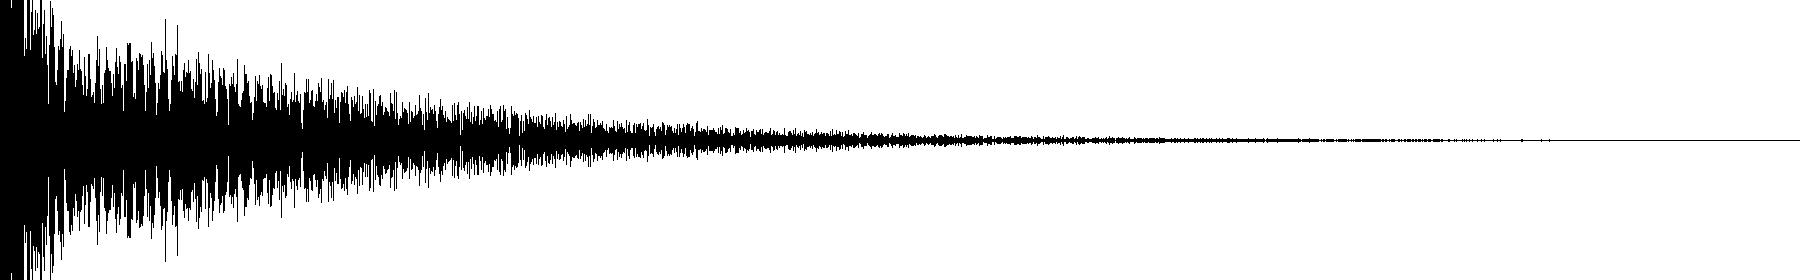 metallic dubstep snare